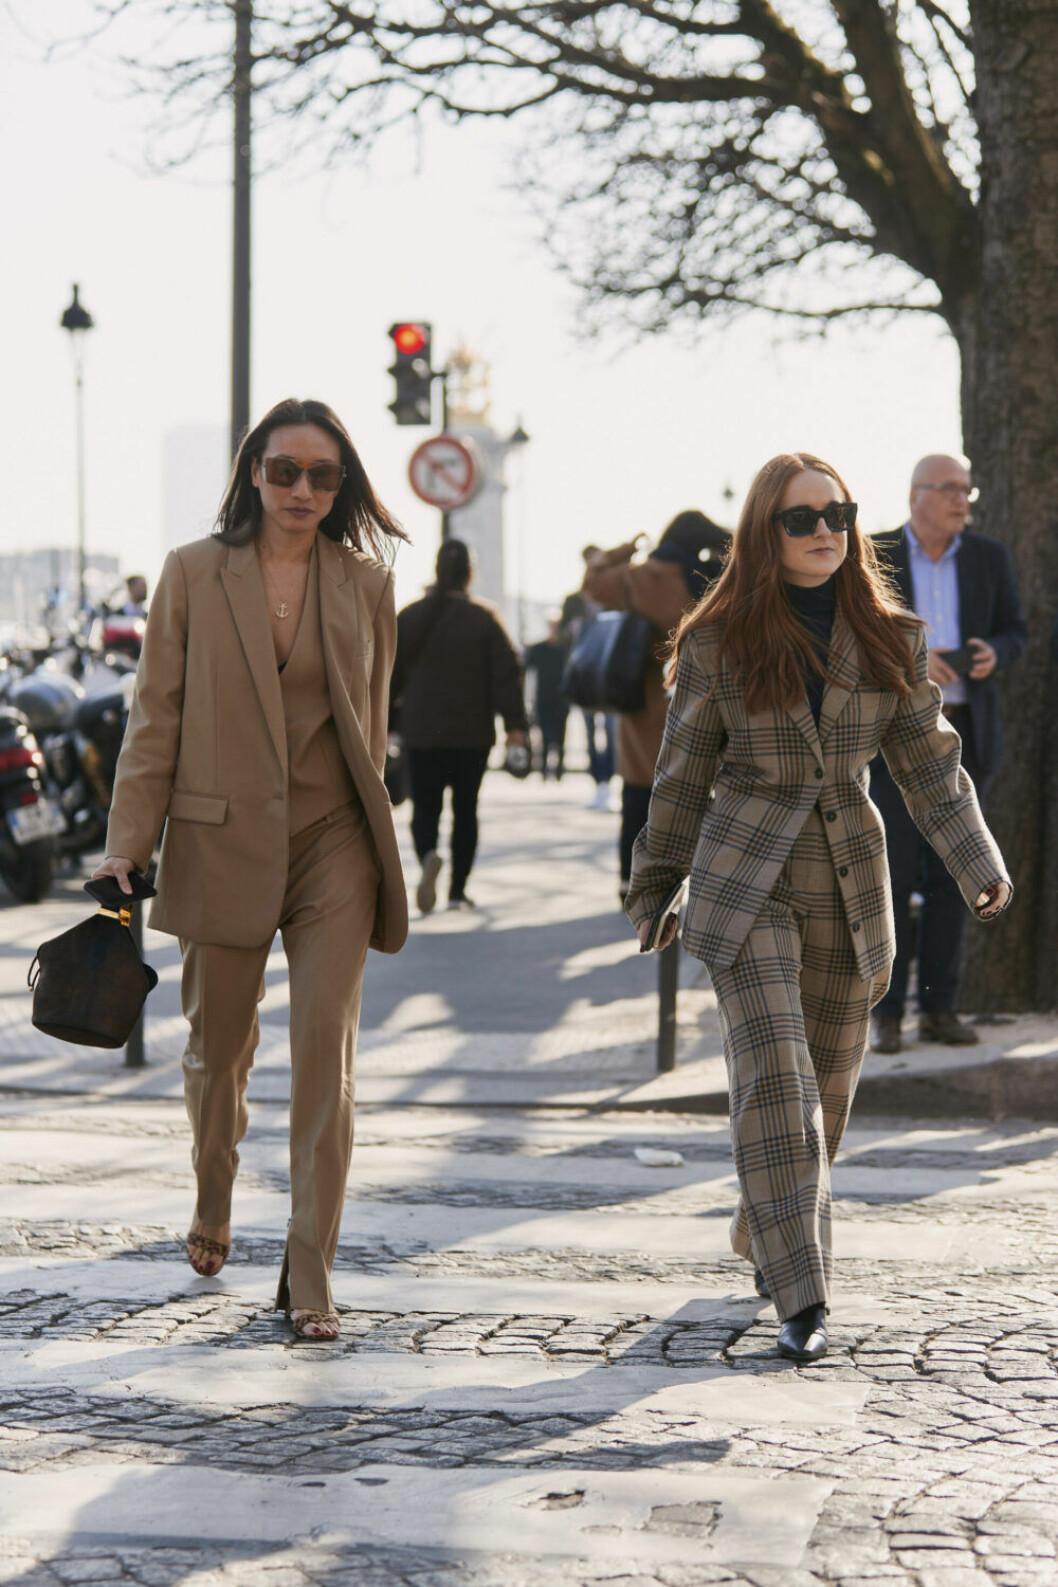 Streetstyle Paris FW, två kvinnor i kostymer.